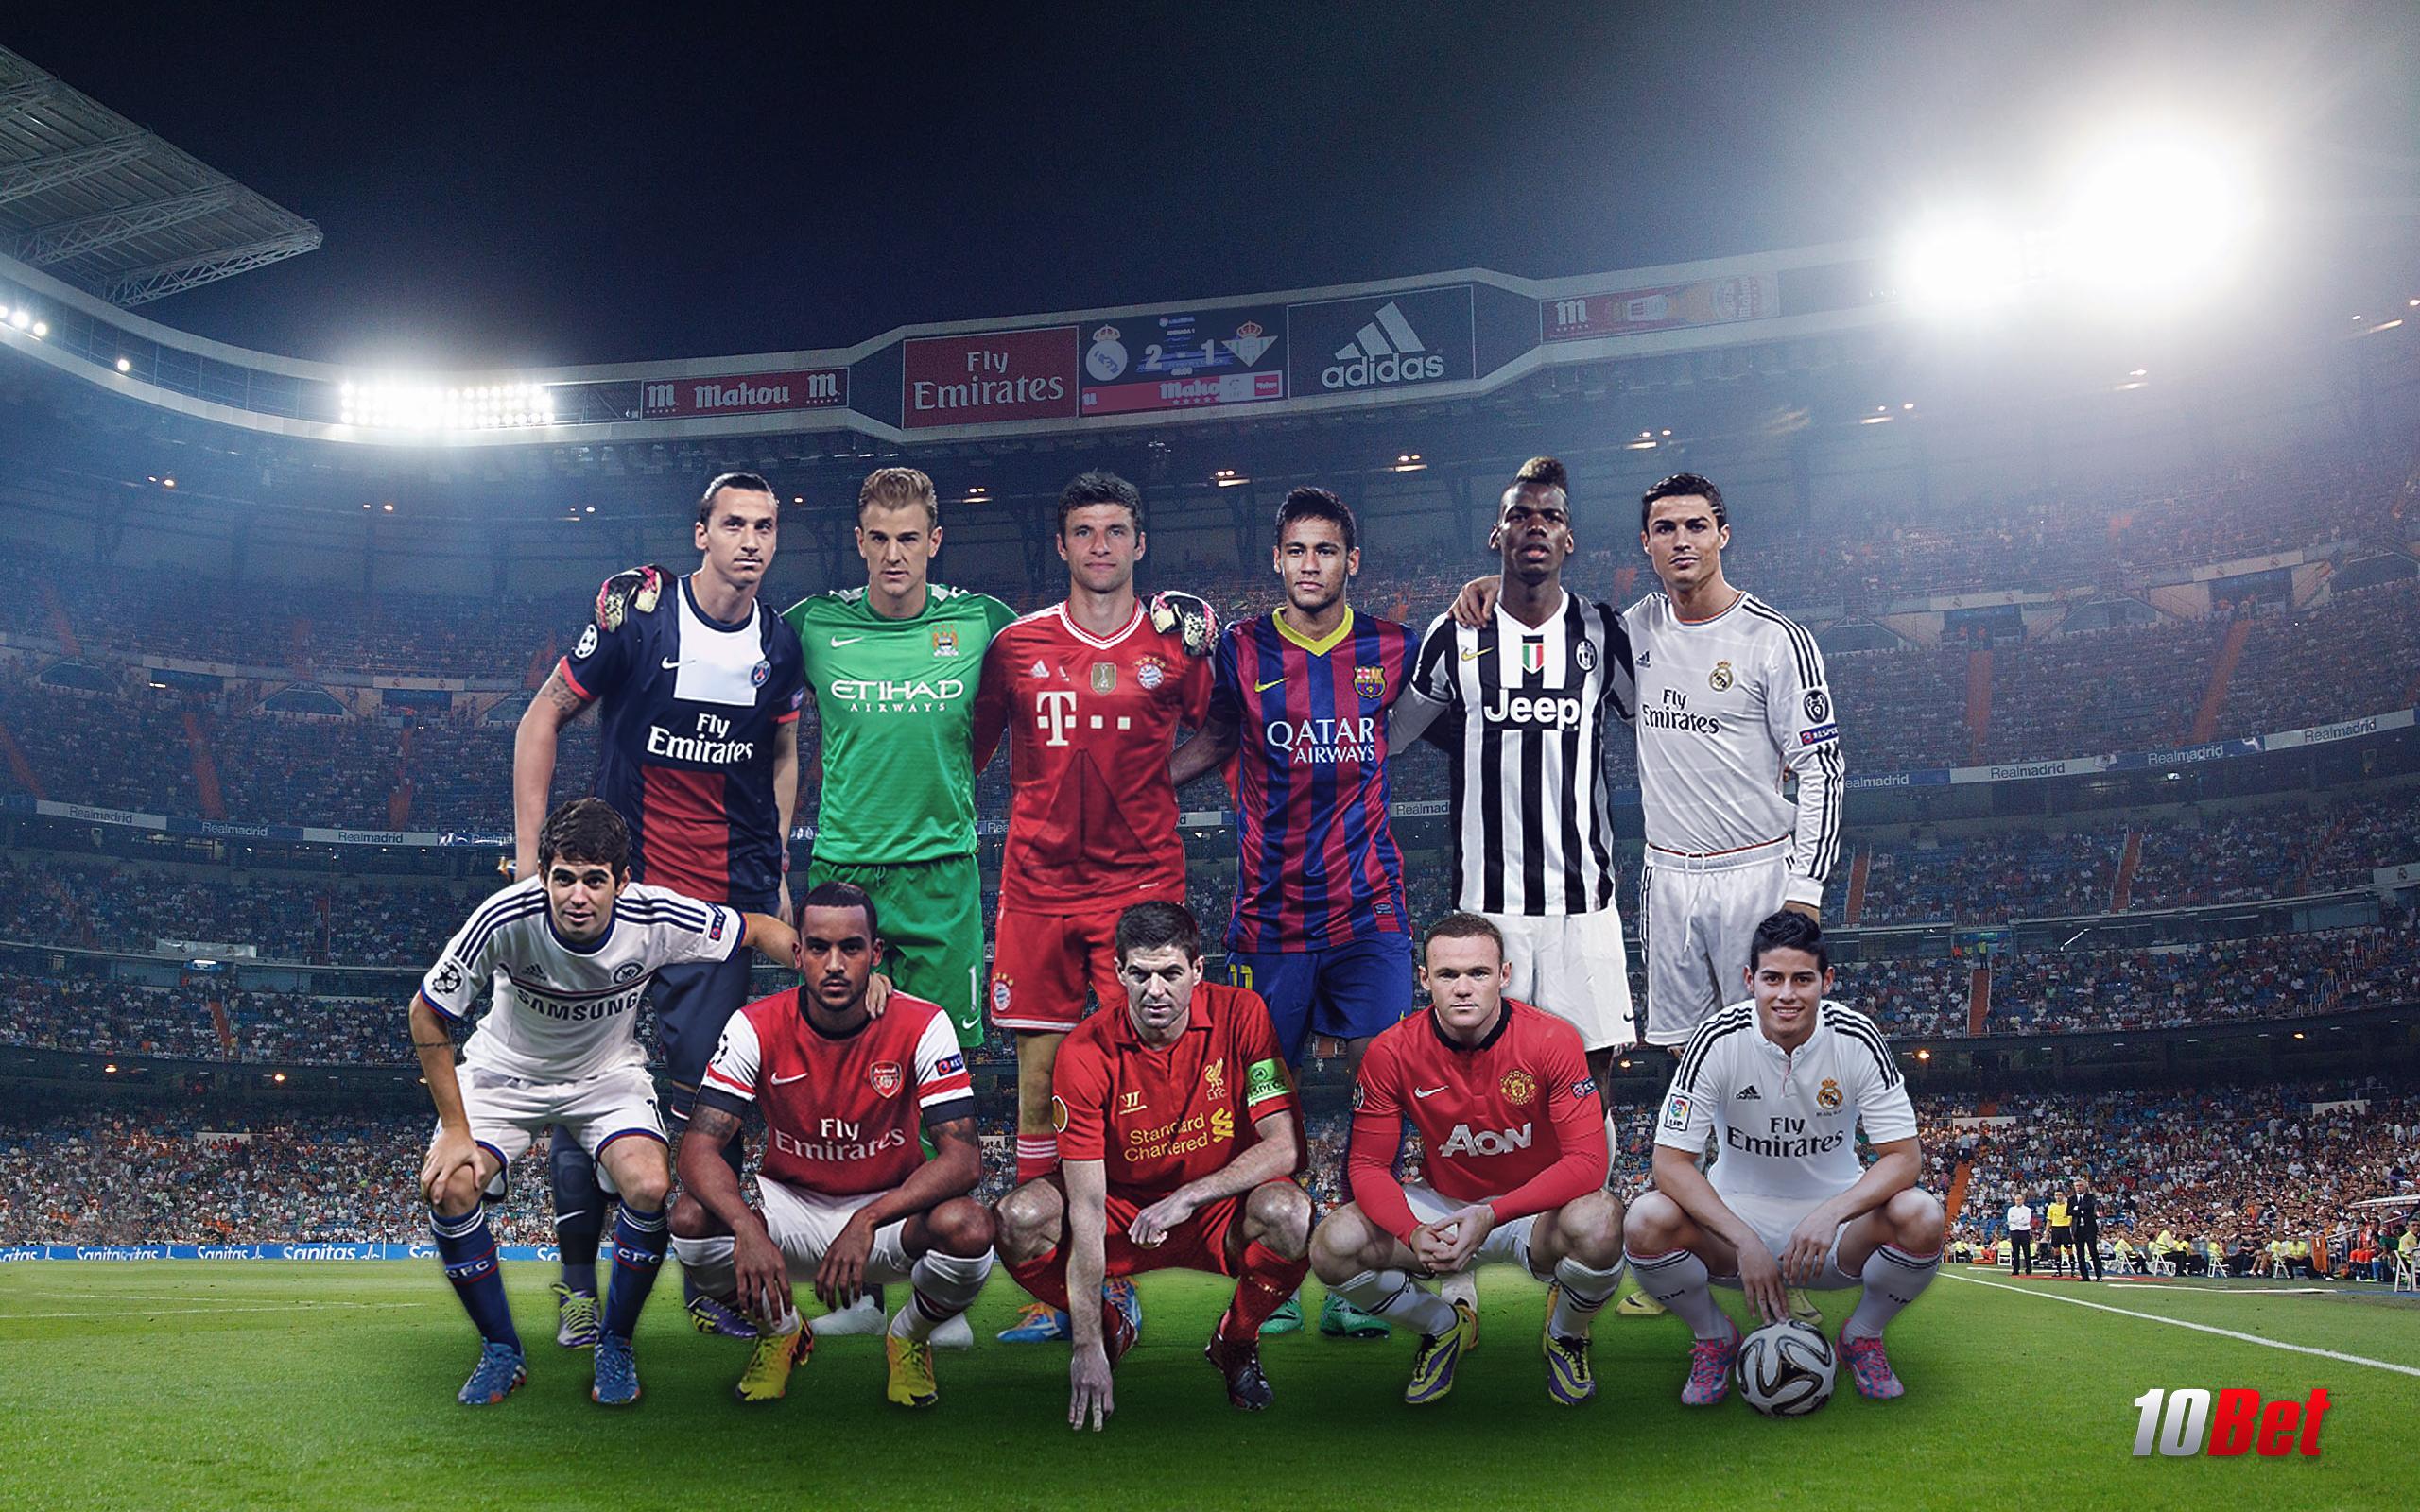 Juventus Wallpaper 2015 | The Art Mad Wallpapers